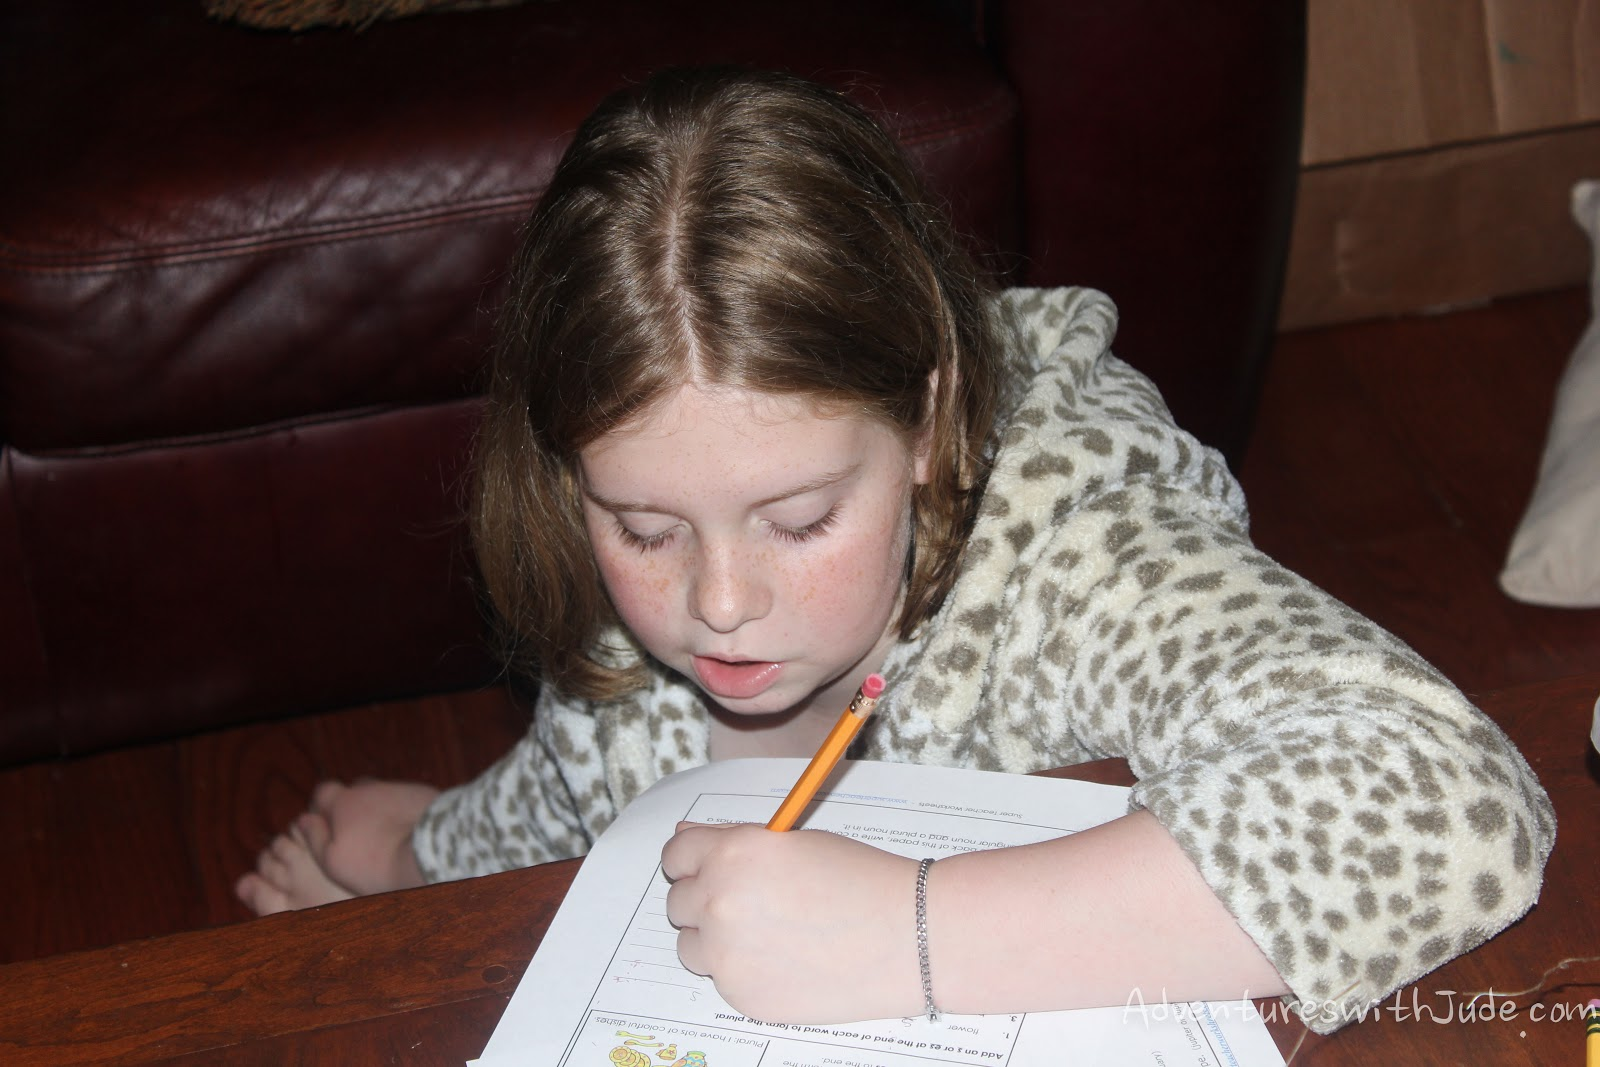 math worksheet : super teacher worksheets 4th grade grammar  autumn  : Super Teacher Worksheets Math 4th Grade